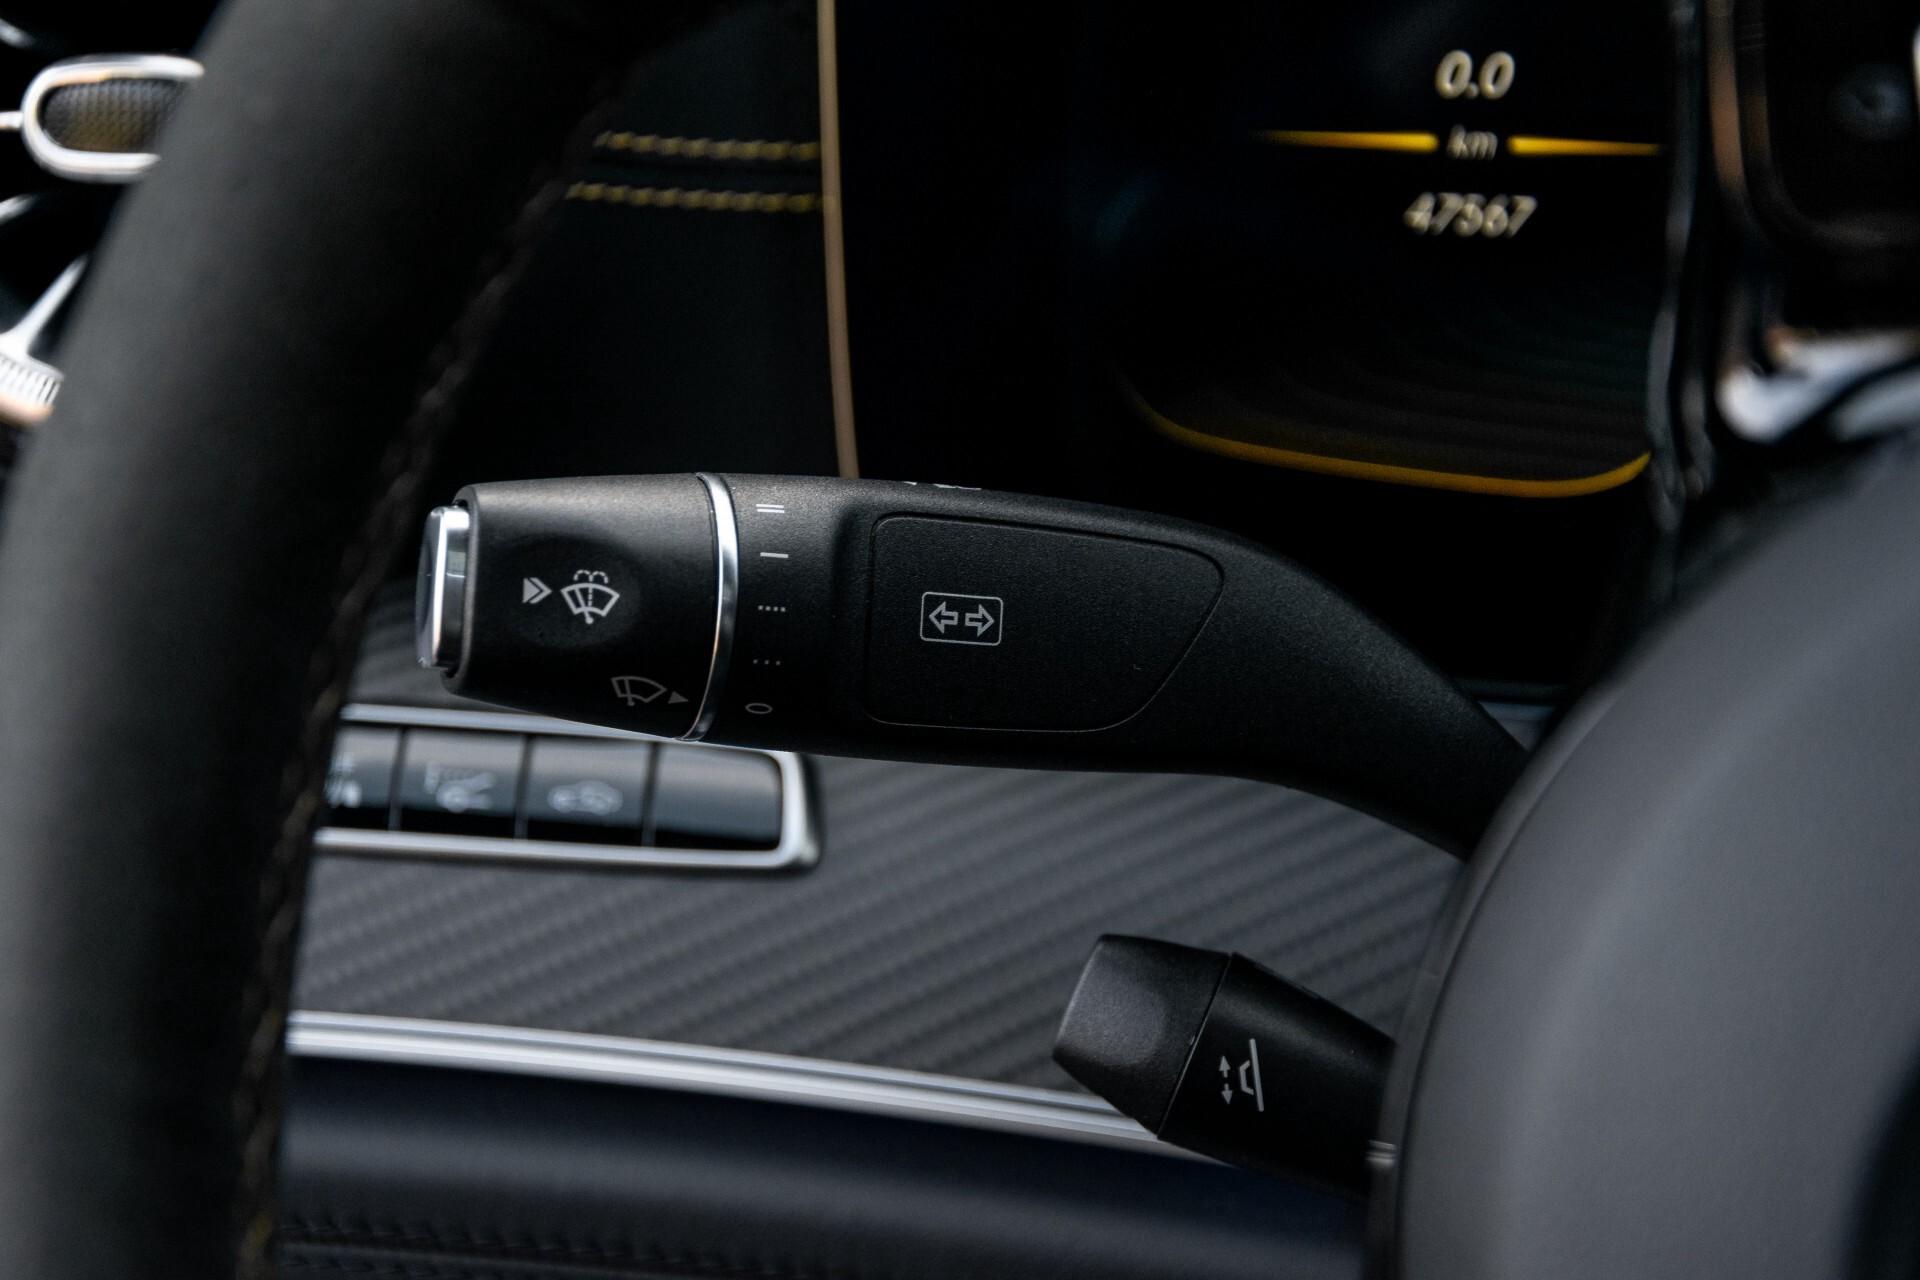 Mercedes-Benz AMG GT 4-Door Coupe 63 S 4MATIC+ Edition 1 Keramisch/Carbon/First Class/Dynamic Plus/Burmester High End 3D Aut9 Foto 11